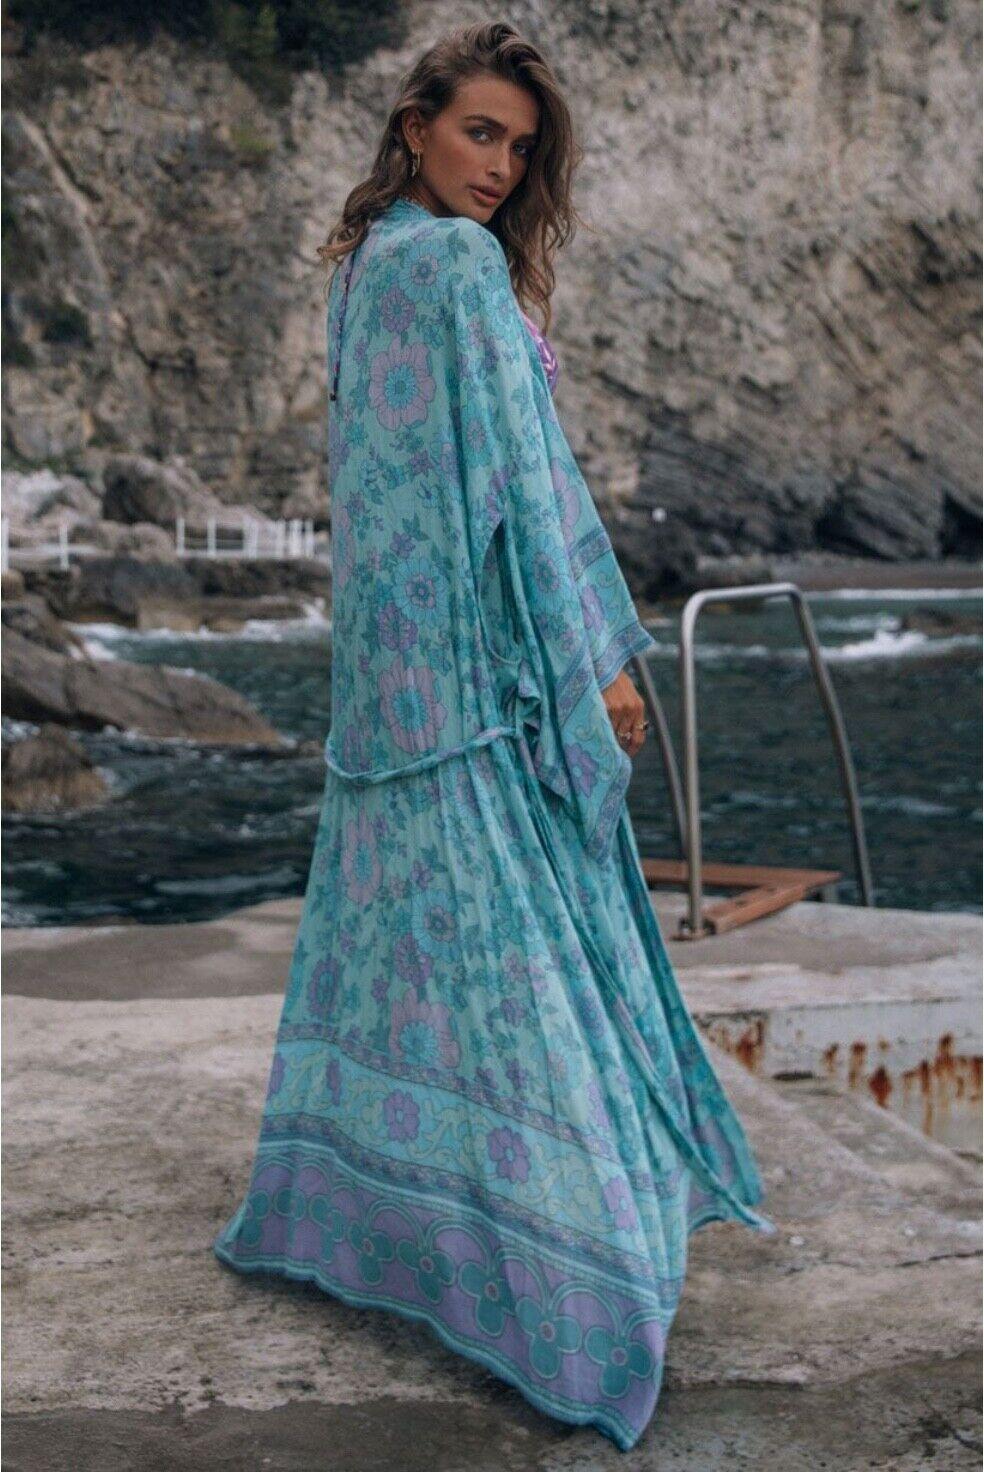 🦄 BNWT Spell & The Gypsy Collective Buttercup Robe / Kimono Size S/M OCEAN